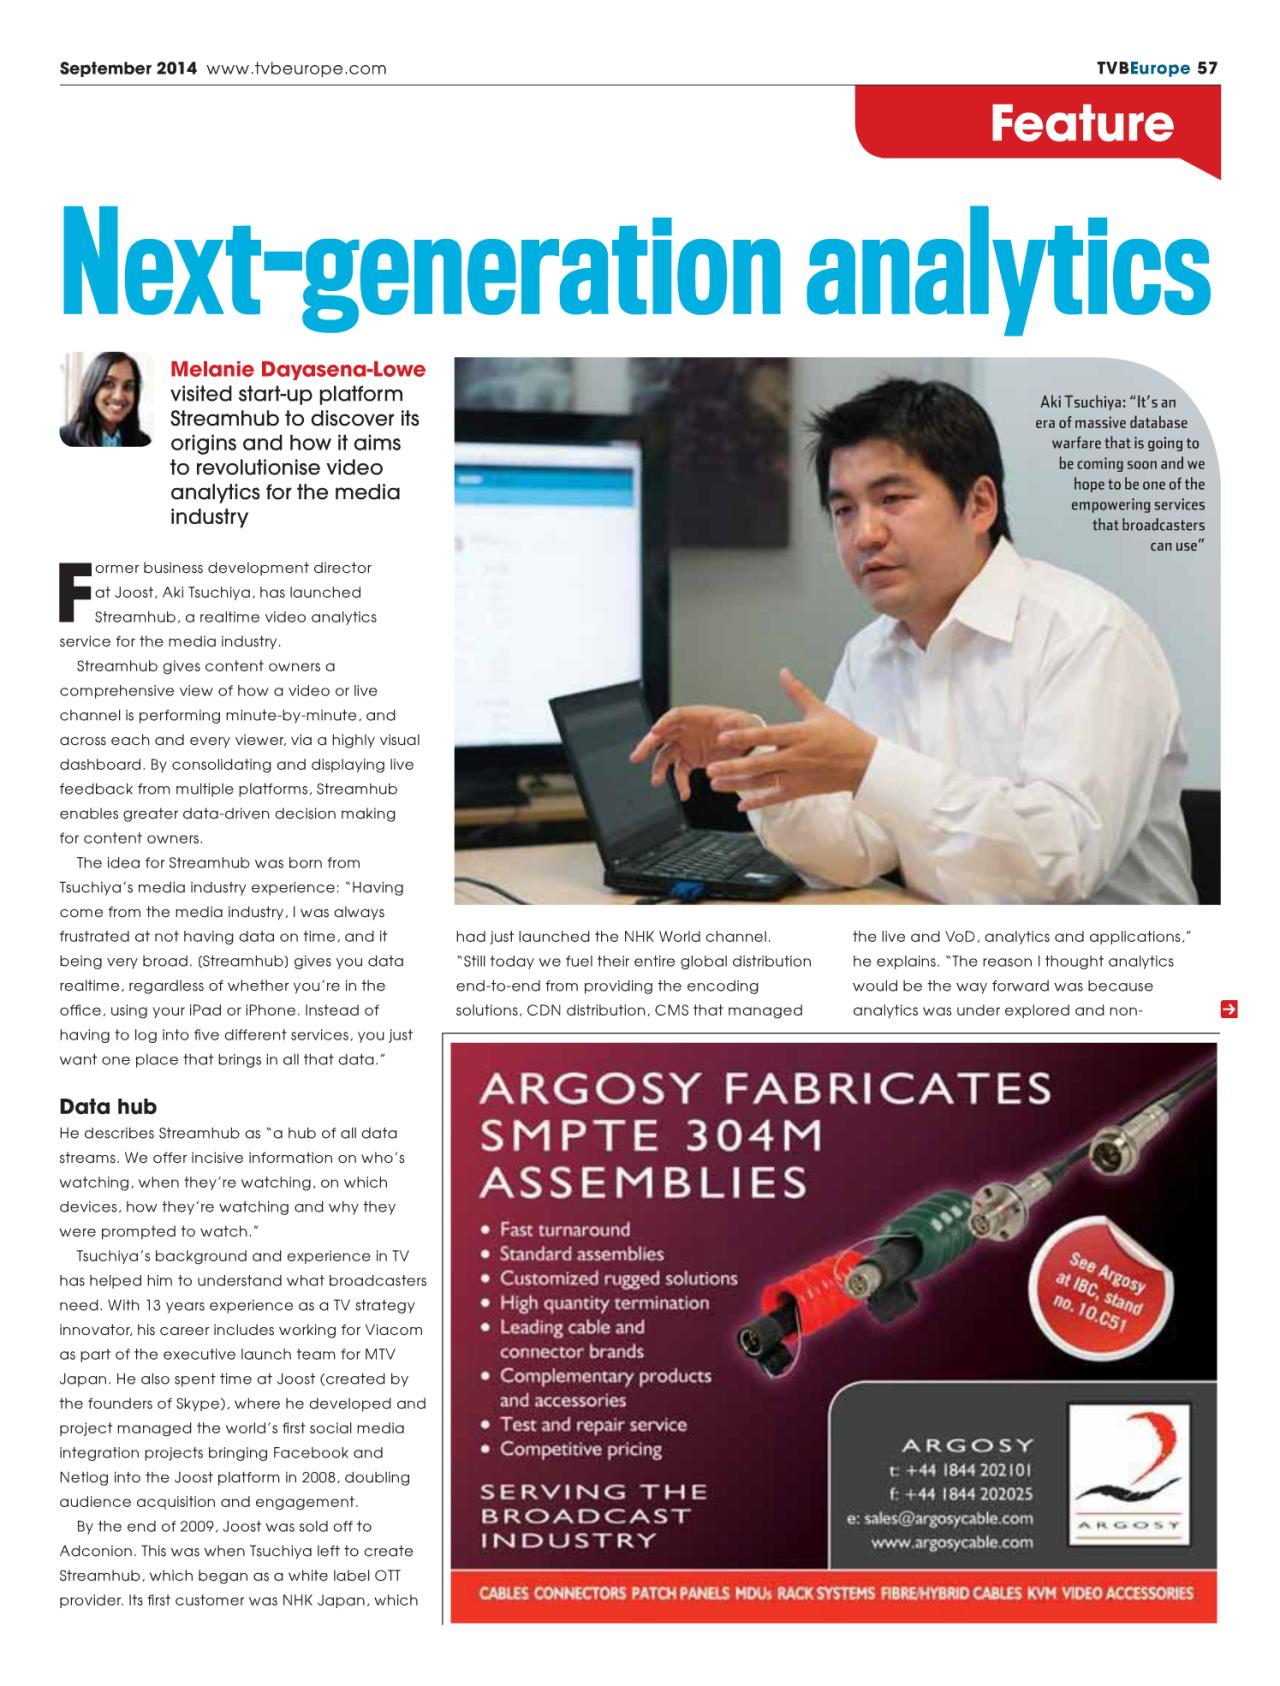 Next Generation Analytics 1